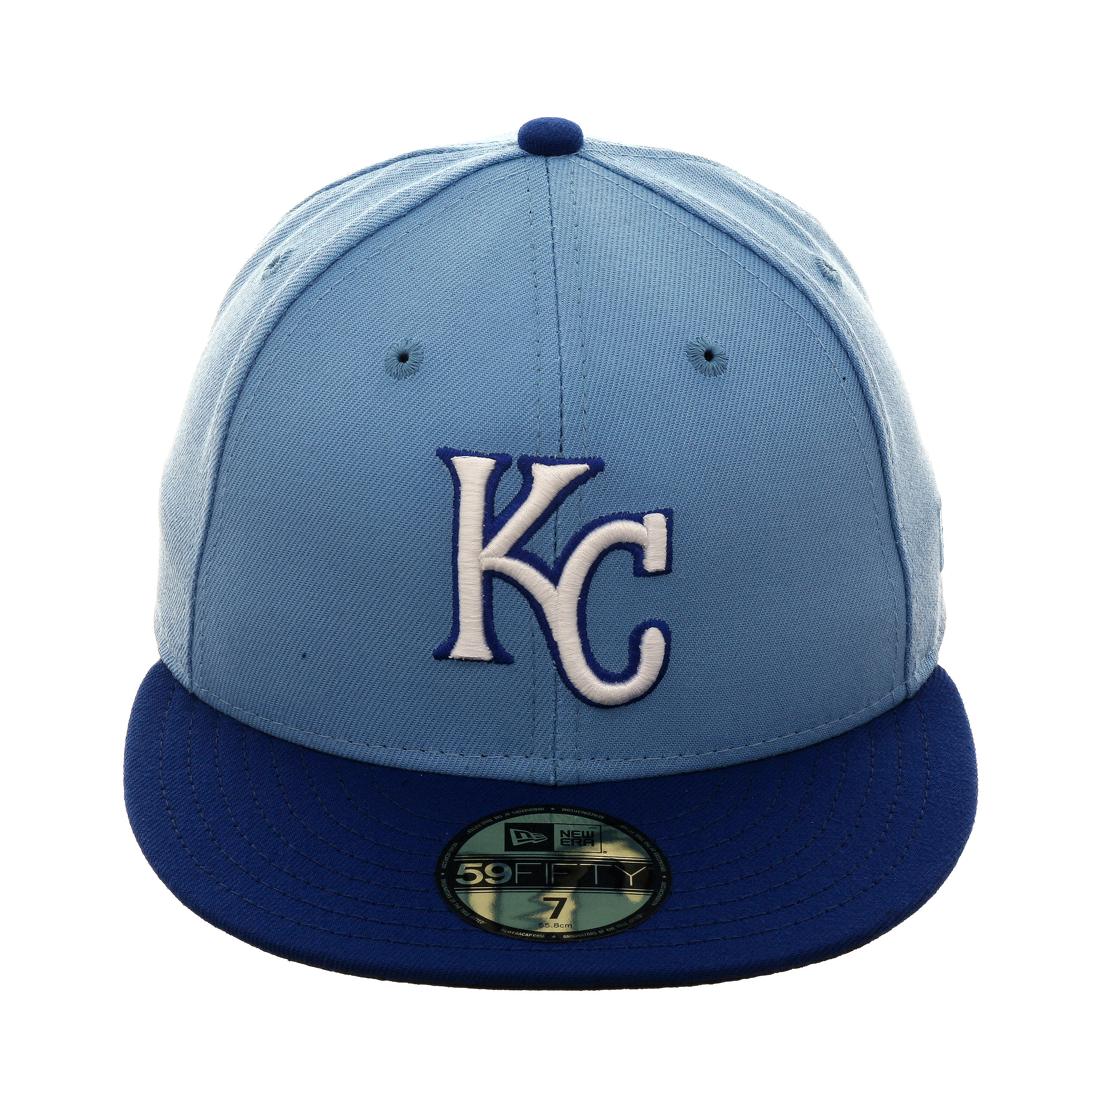 4d12bd72 Exclusive New Era 59Fifty Kansas City Royals Hat - 2T Light Blue ...